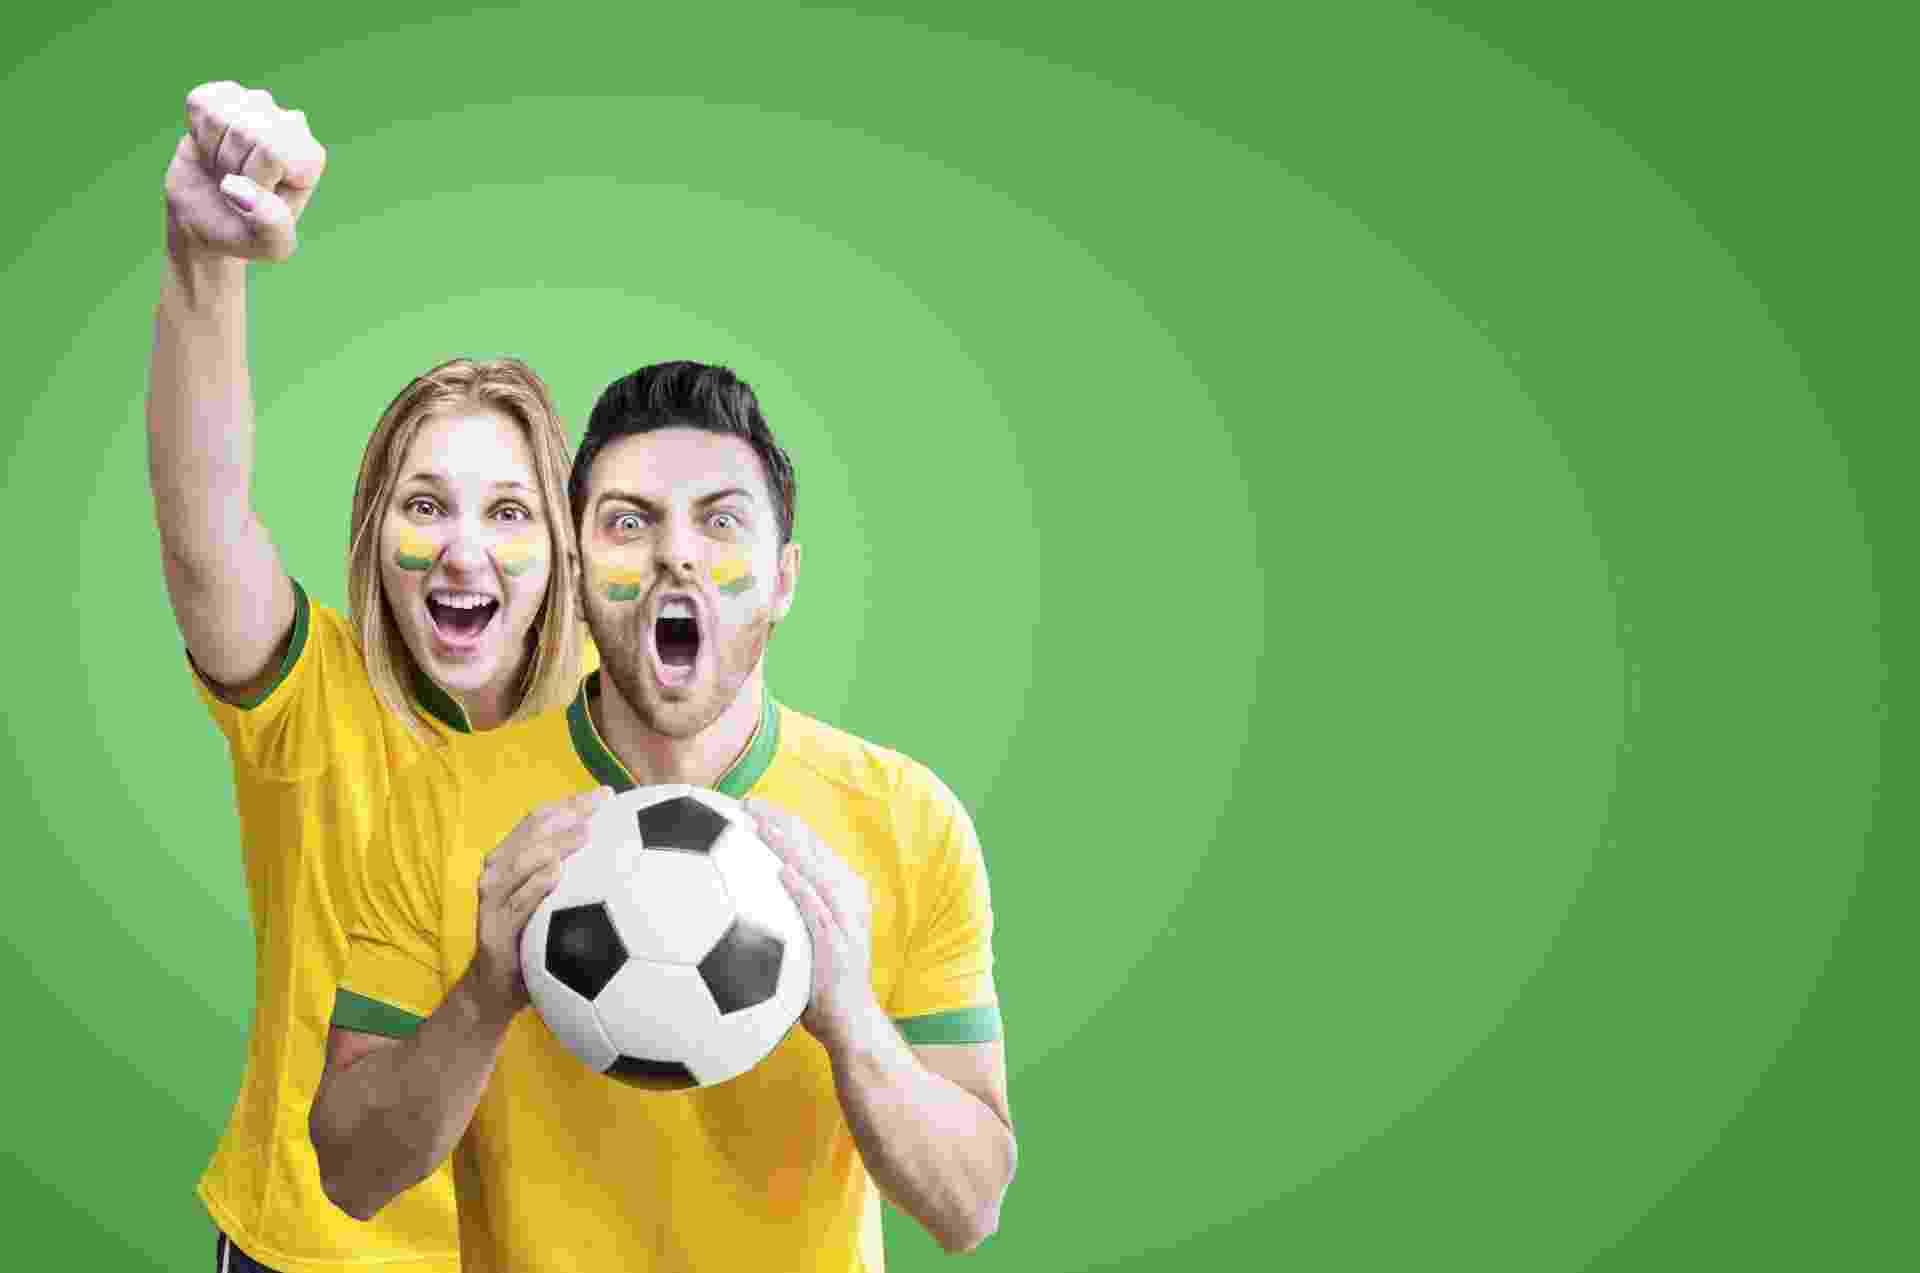 Copa do Mundo, torcedores - Thinkstock